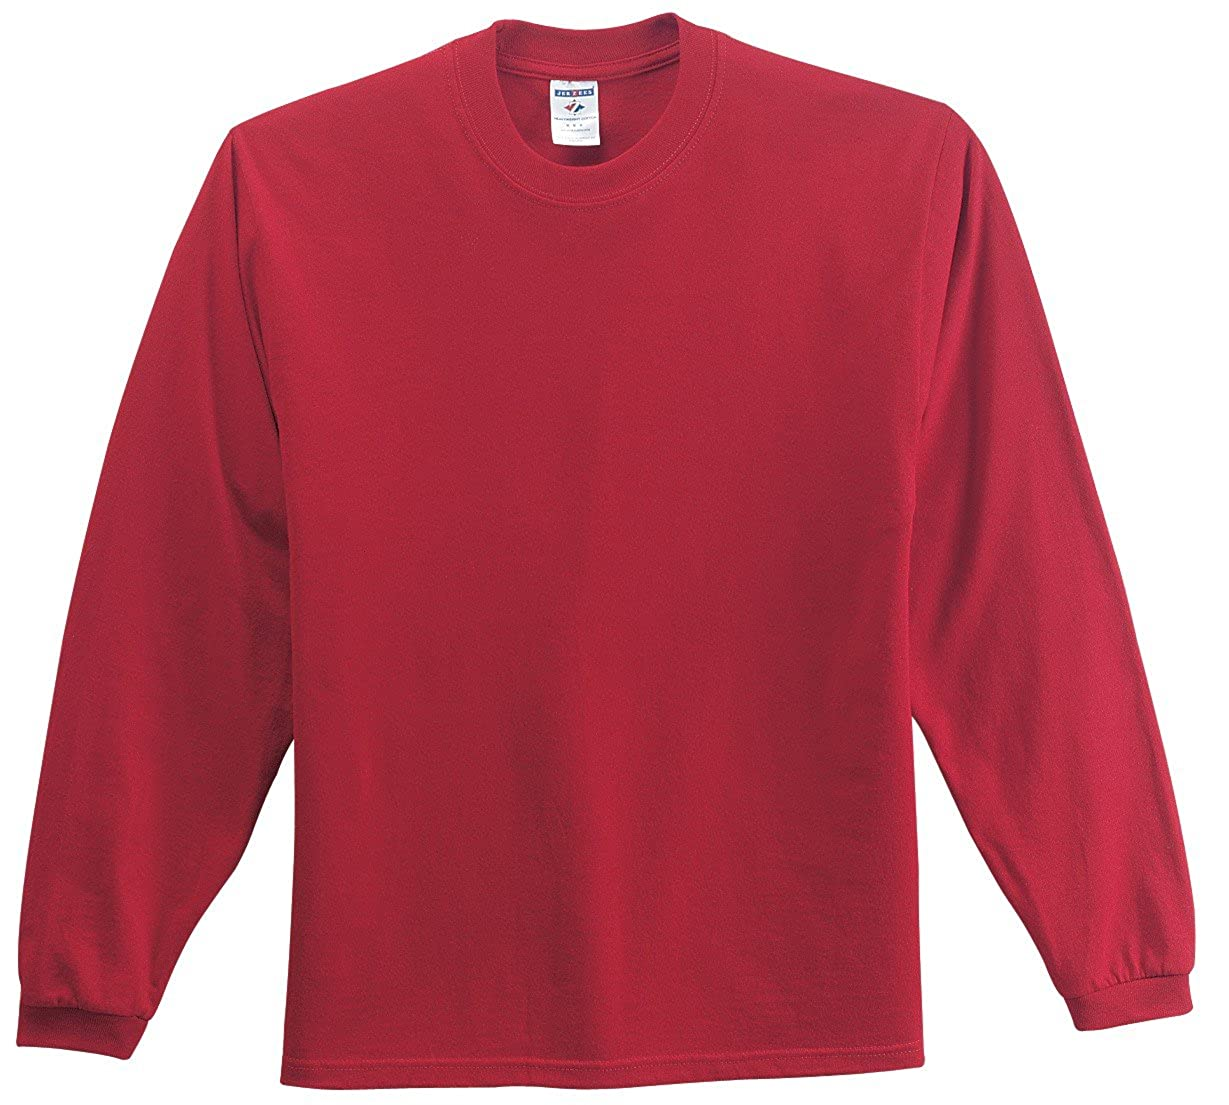 Jerzees 363LSR HiDENSI-T Long Sleeve T-Shirt